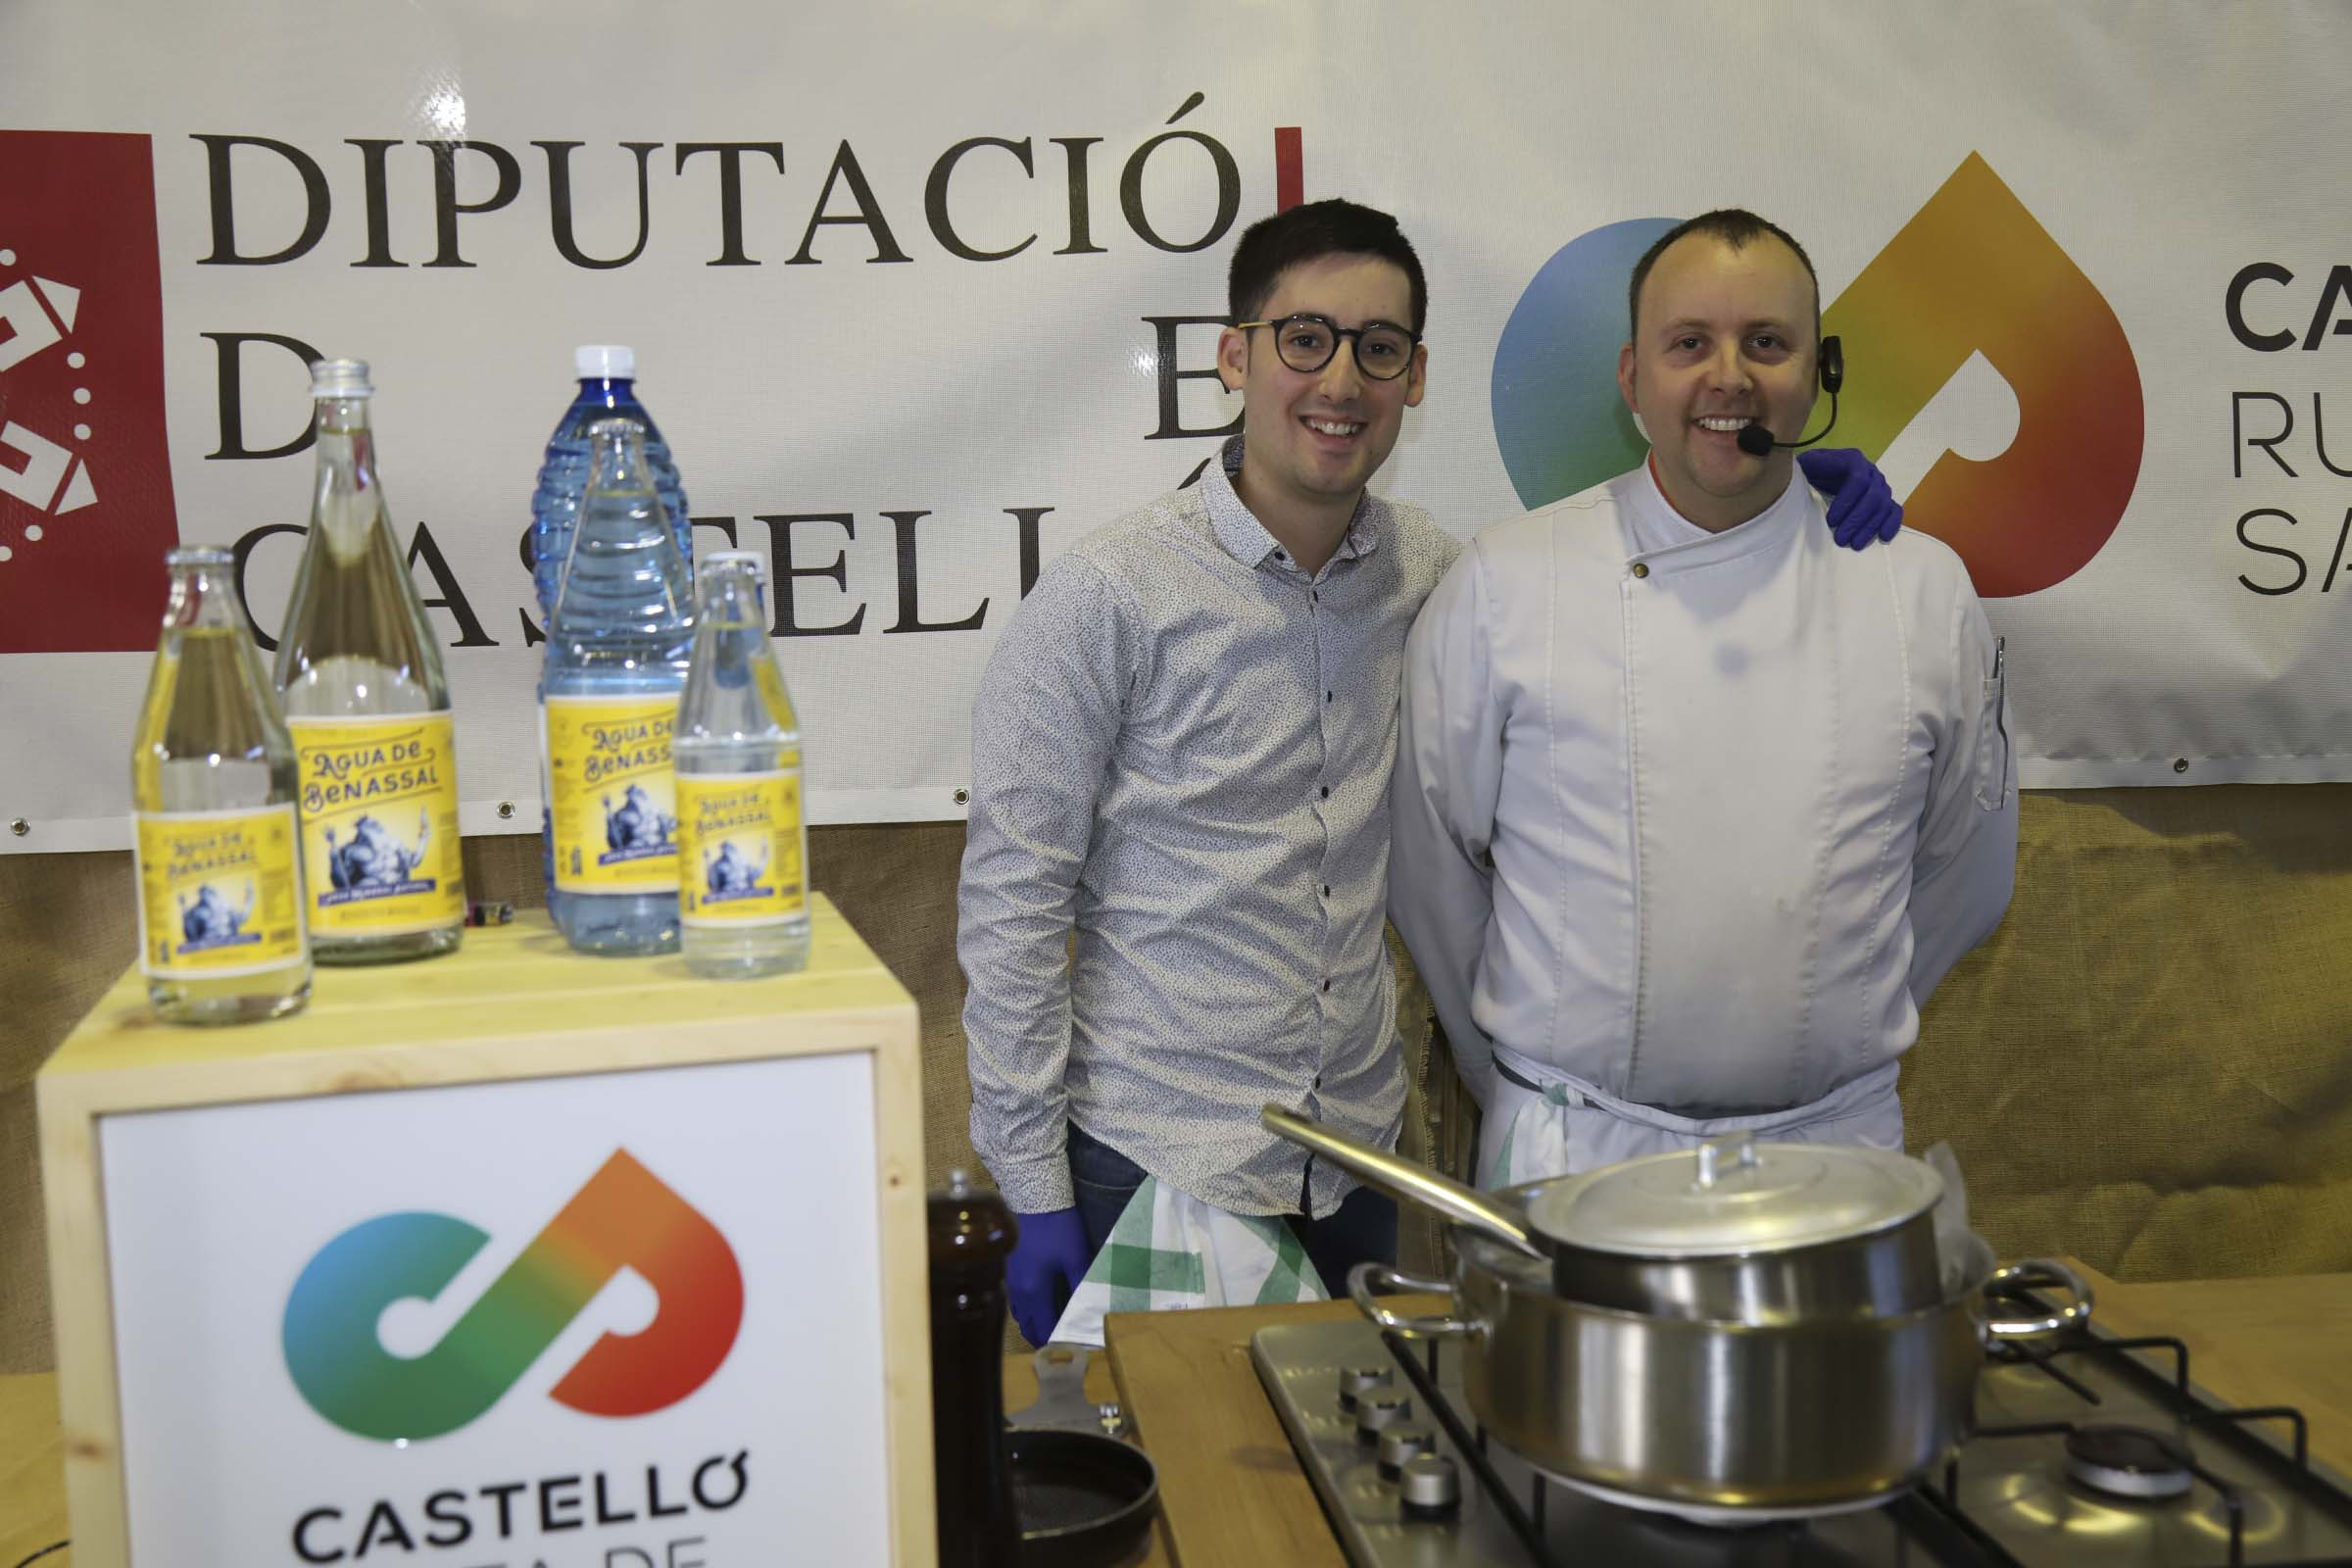 Agua de Benassal Origen en la Feria de la Trufa del Maestrat